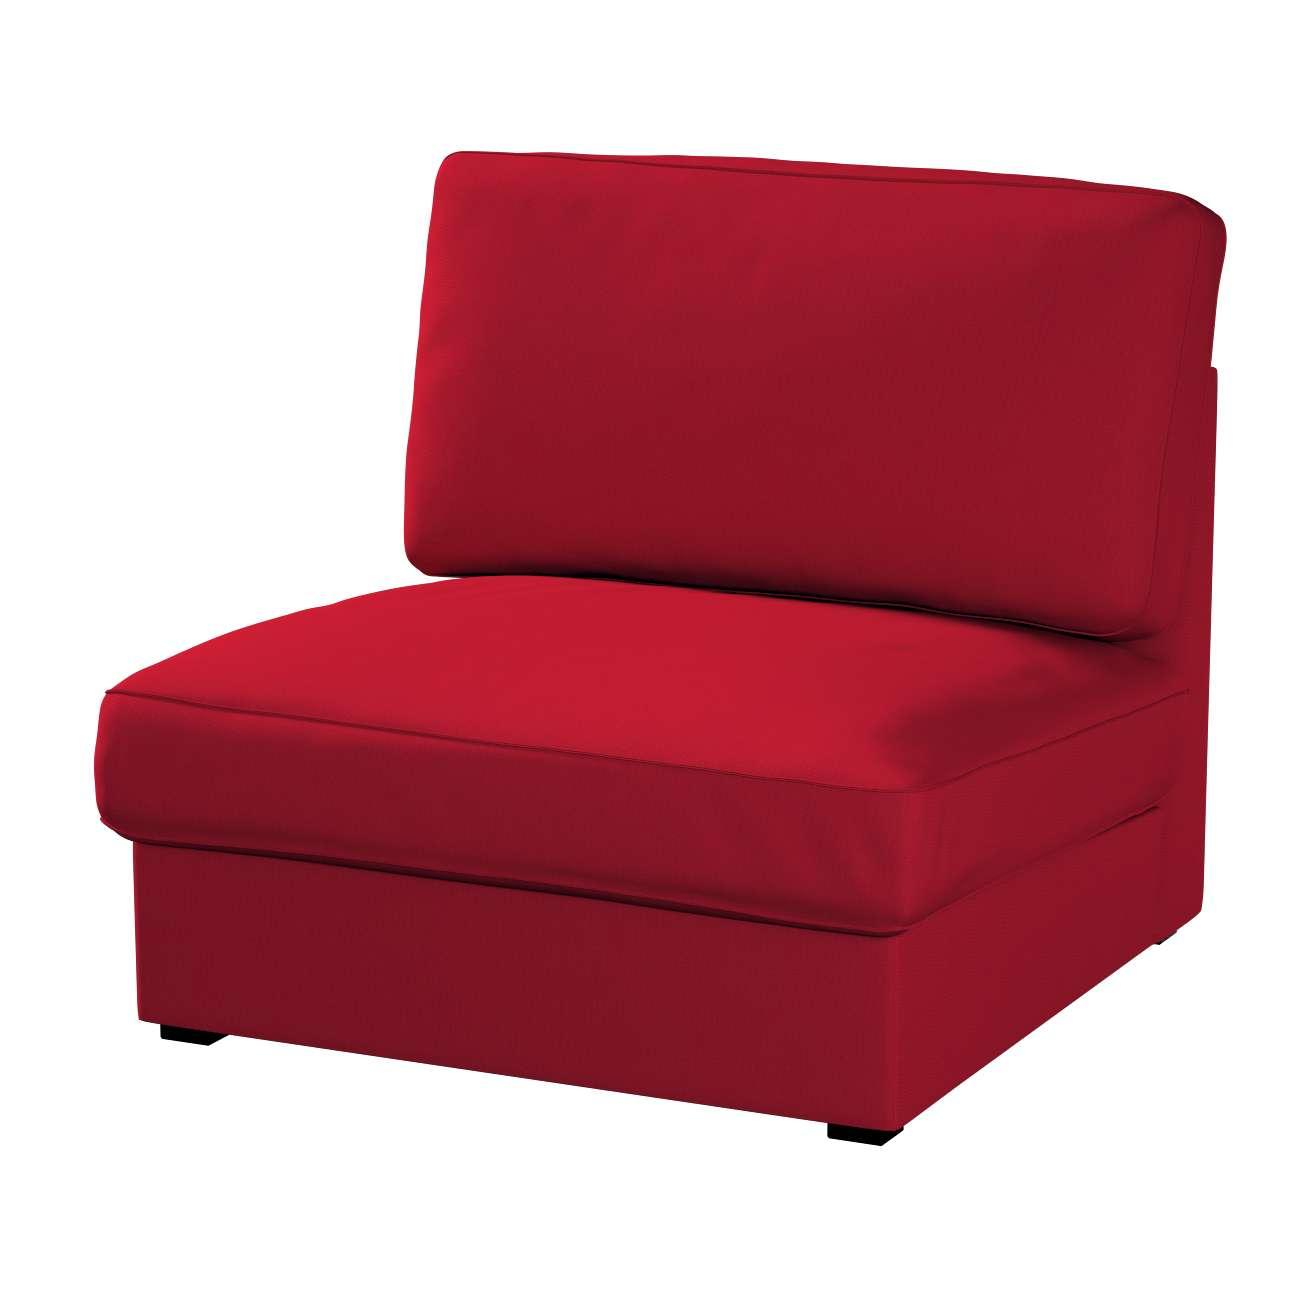 Kivik Sesselbezug Sessel Kivik von der Kollektion Etna, Stoff: 705-60